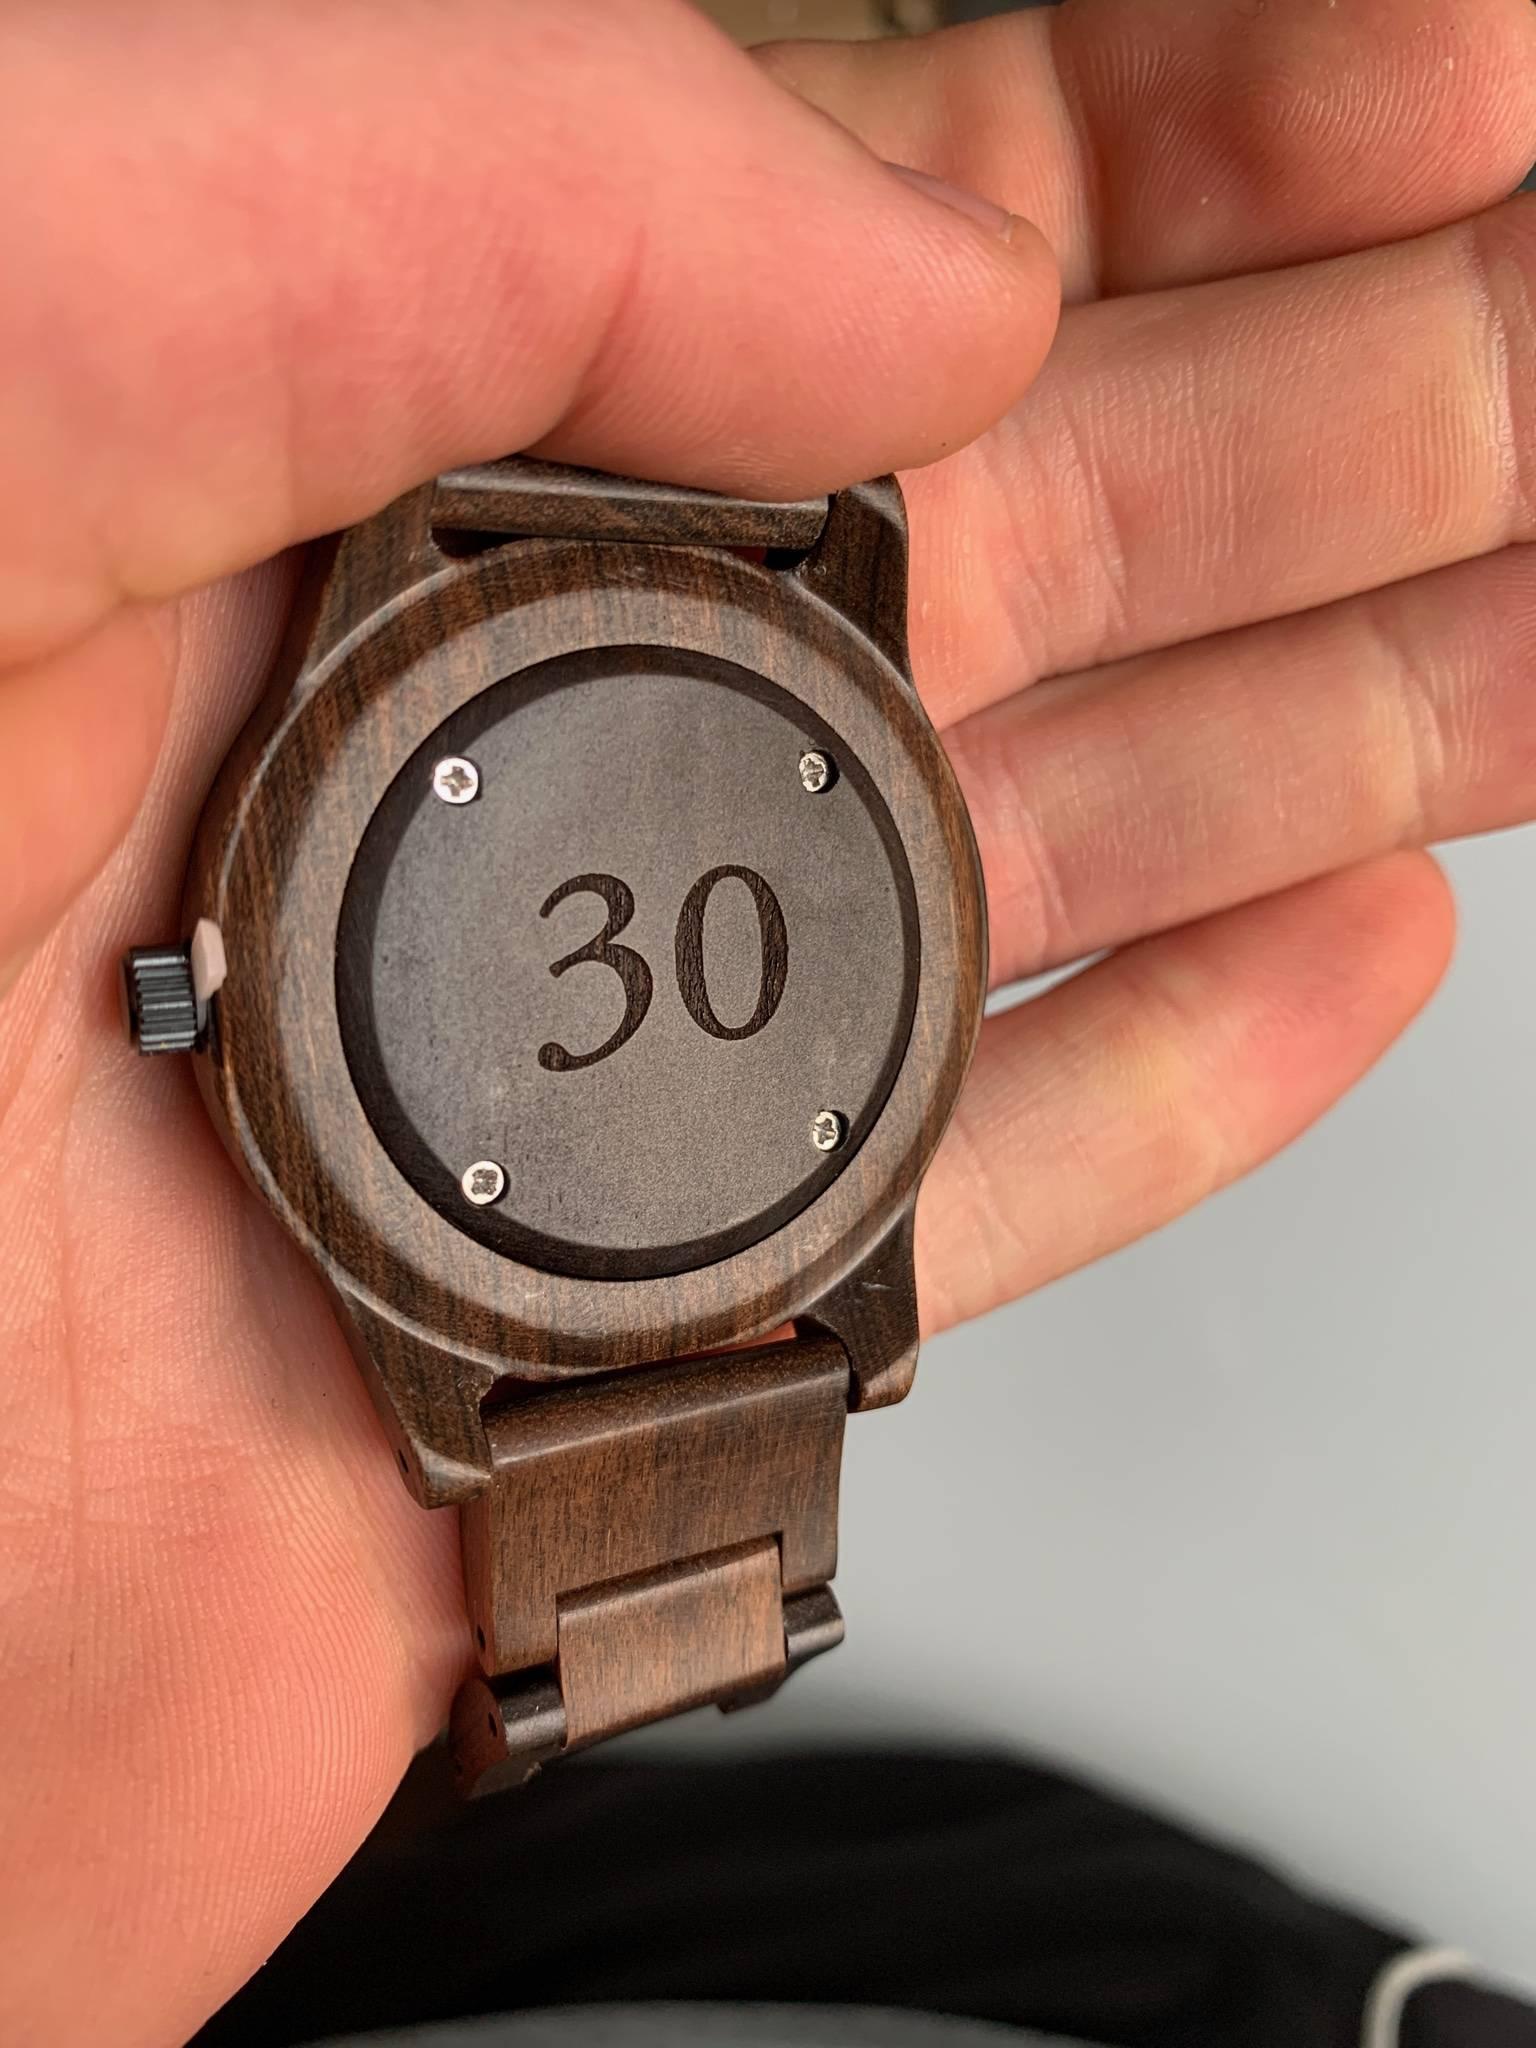 Birthday Gift of Wooden Watch